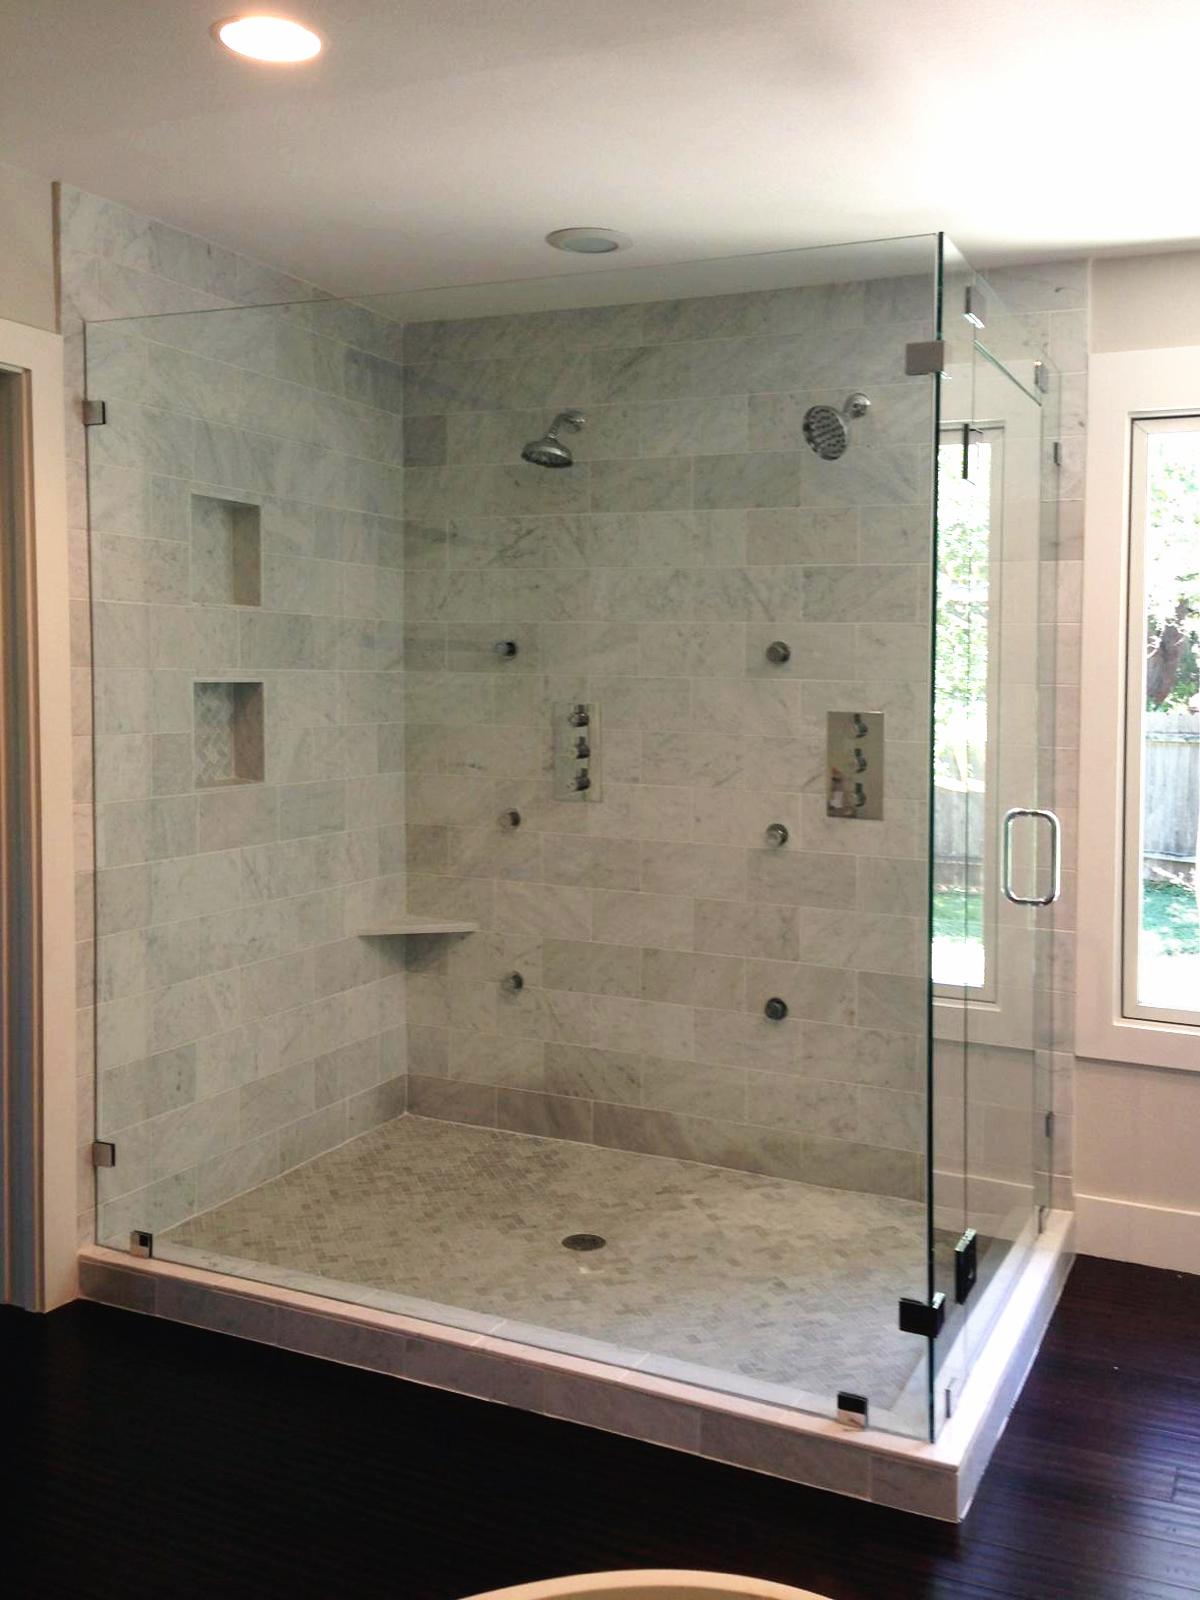 Frameless Shower Doors - Large 90-Degree Enclosure